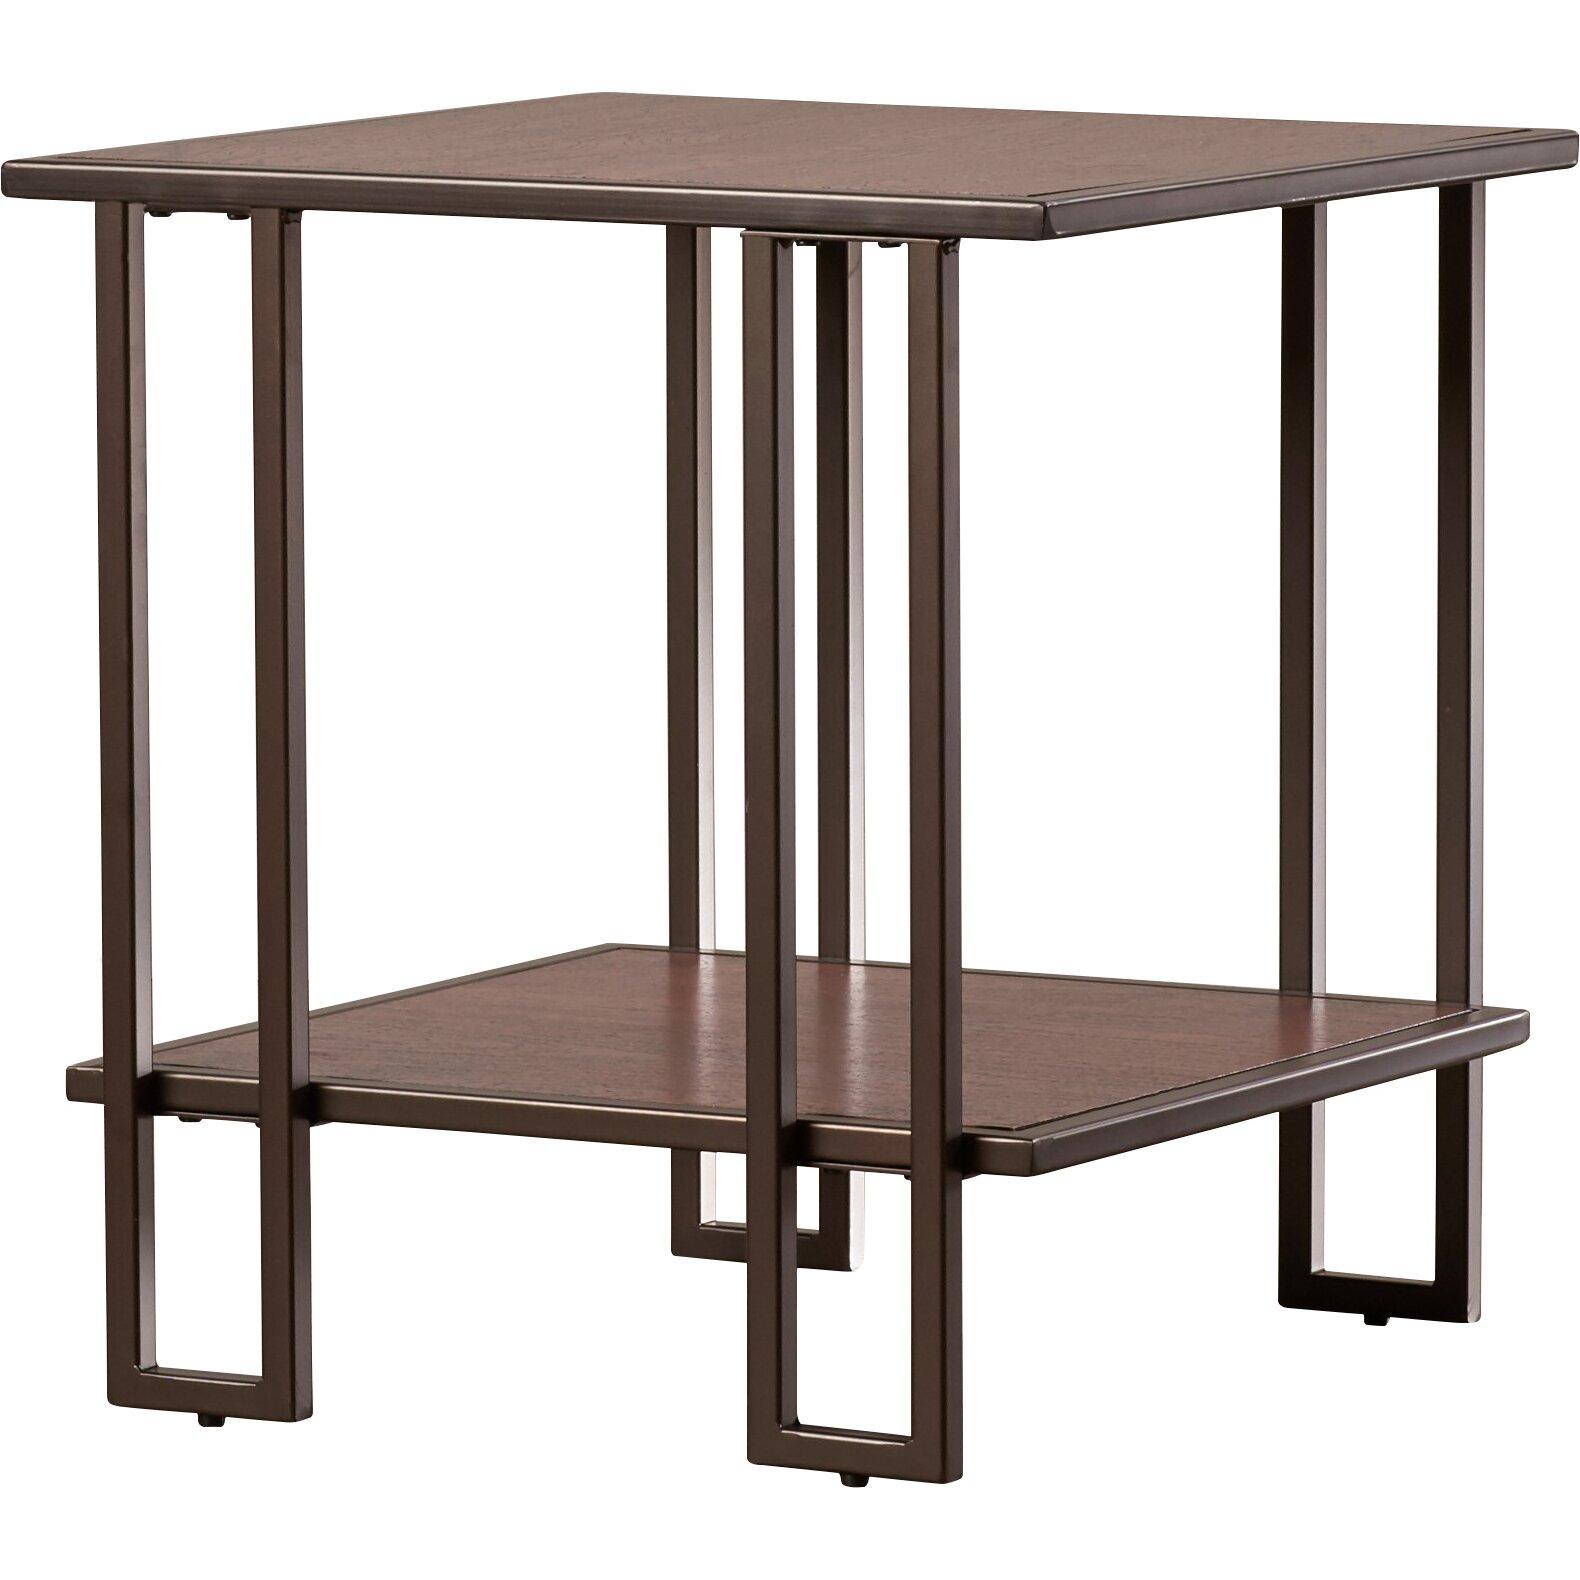 latitude run ruben 3 piece coffee table set reviews wayfair. Black Bedroom Furniture Sets. Home Design Ideas